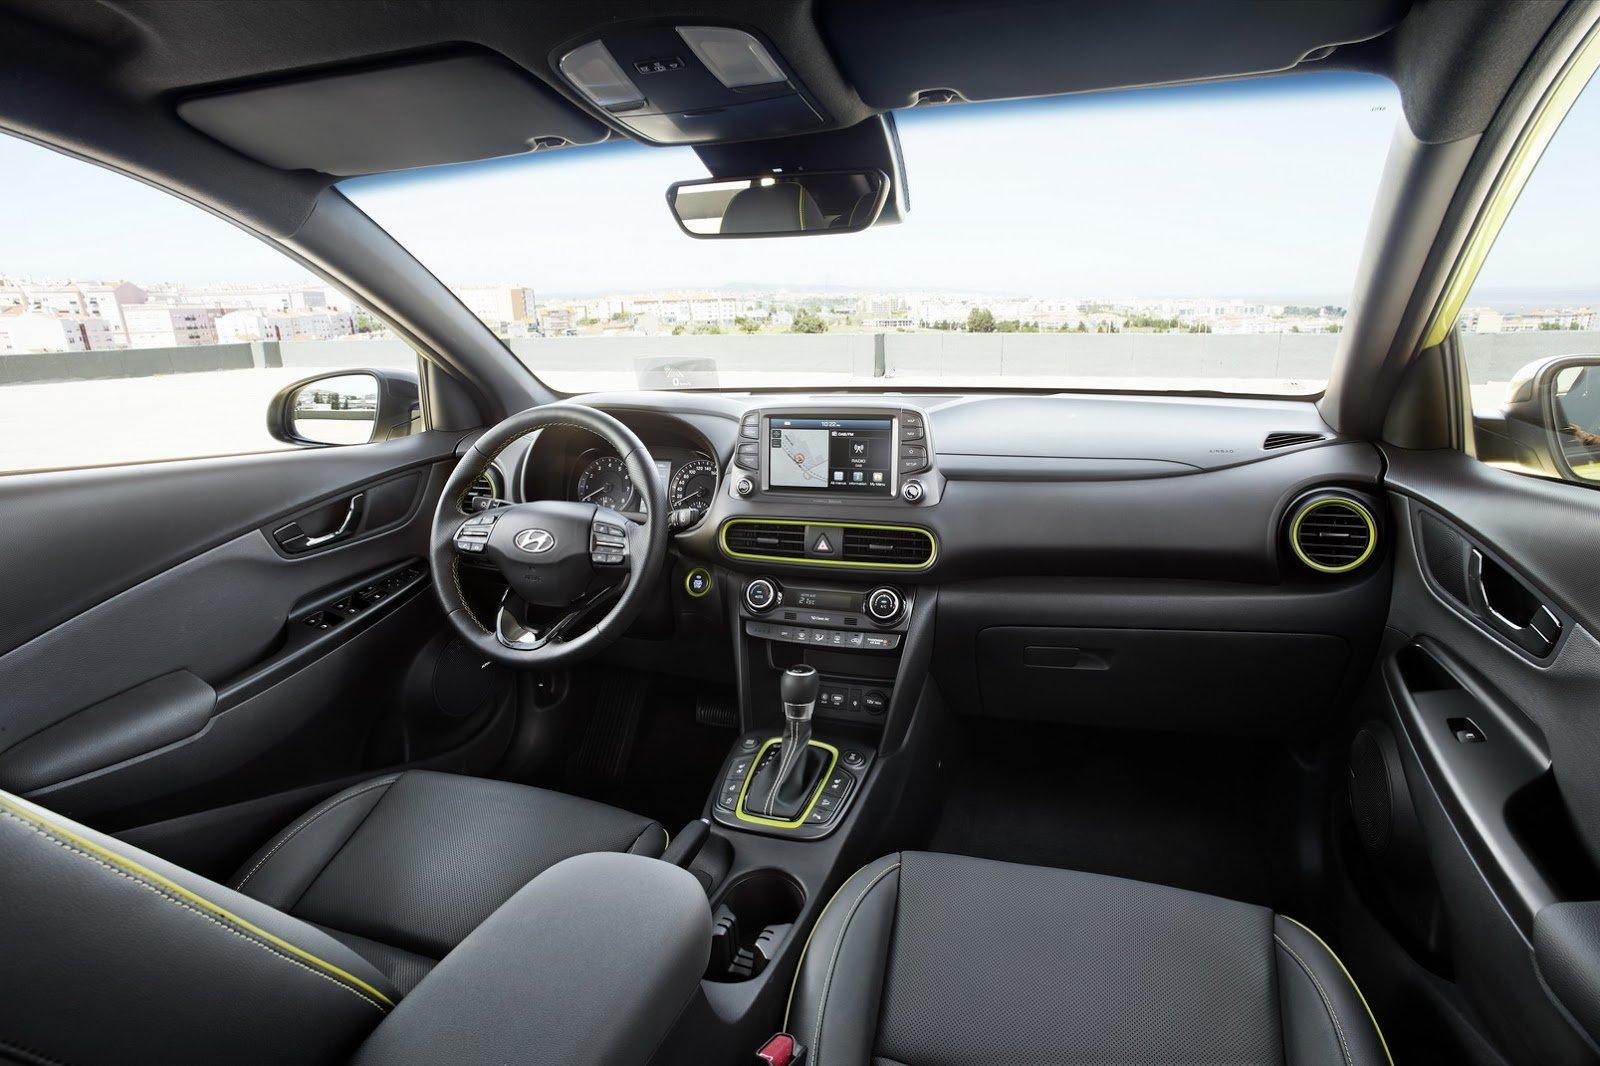 Nội thất xe Hyundai Kona 2020